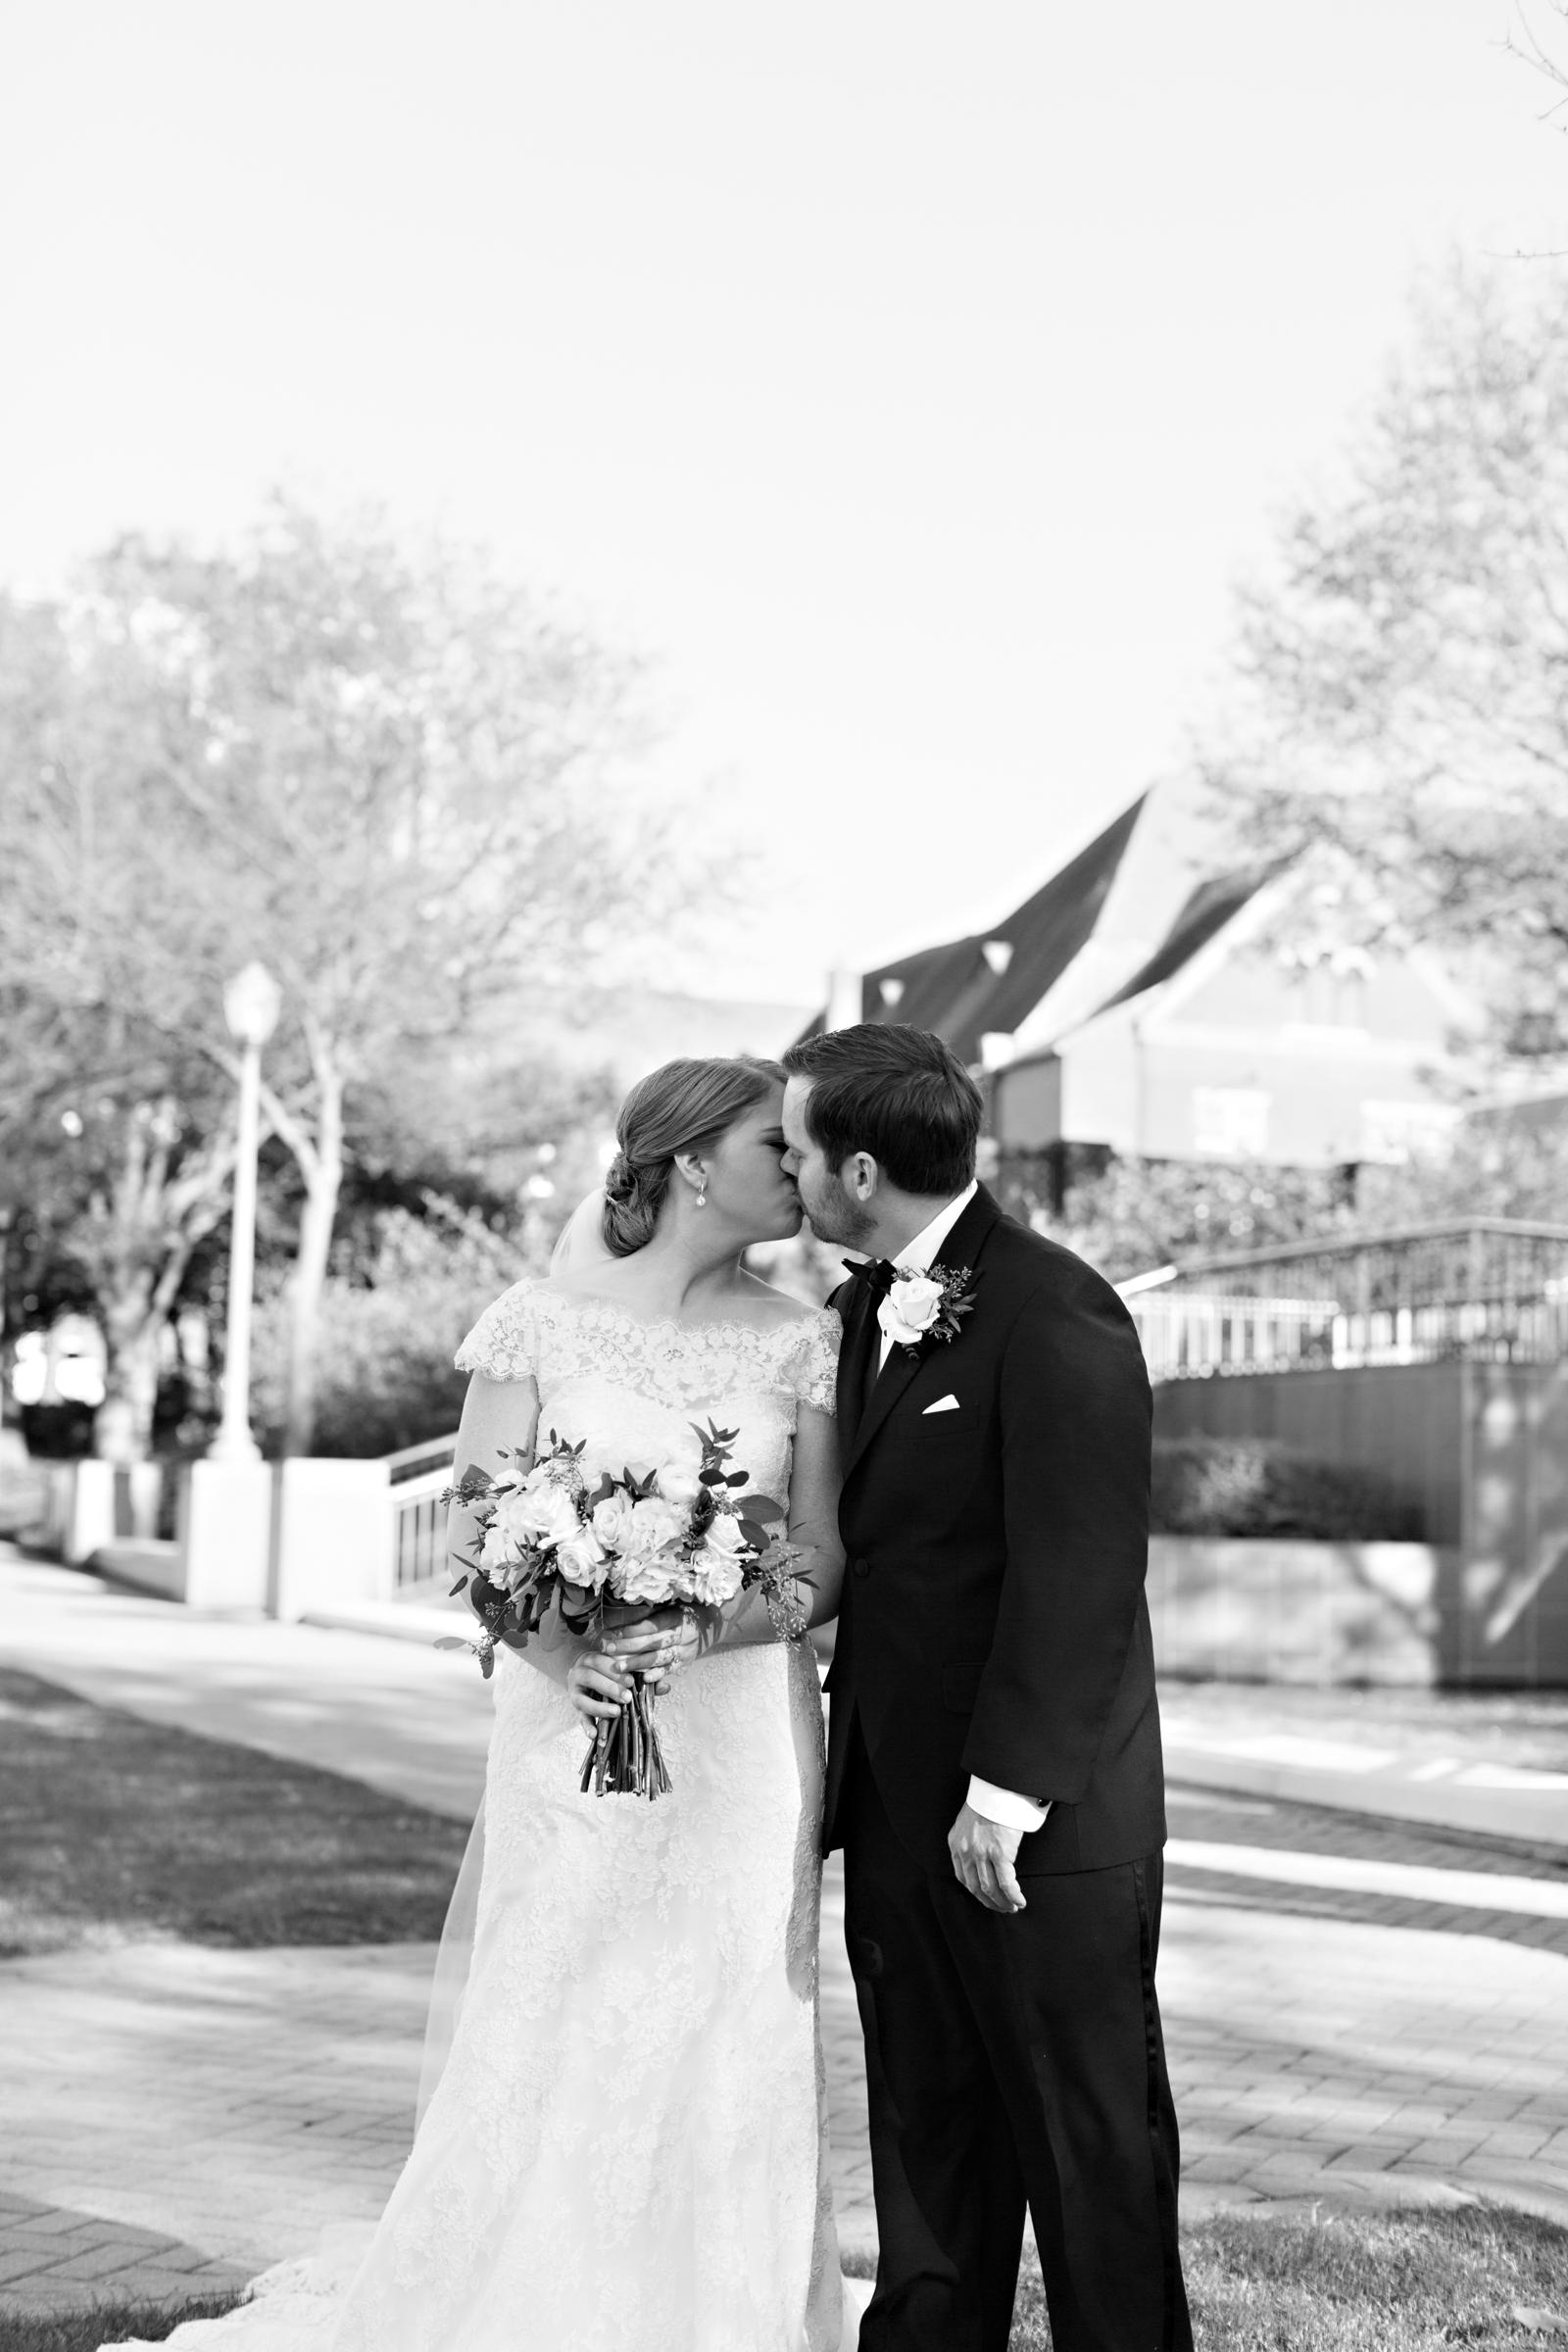 Matty-Drollette-Photography-Weddings-Montgomery-Alabama-115.jpg